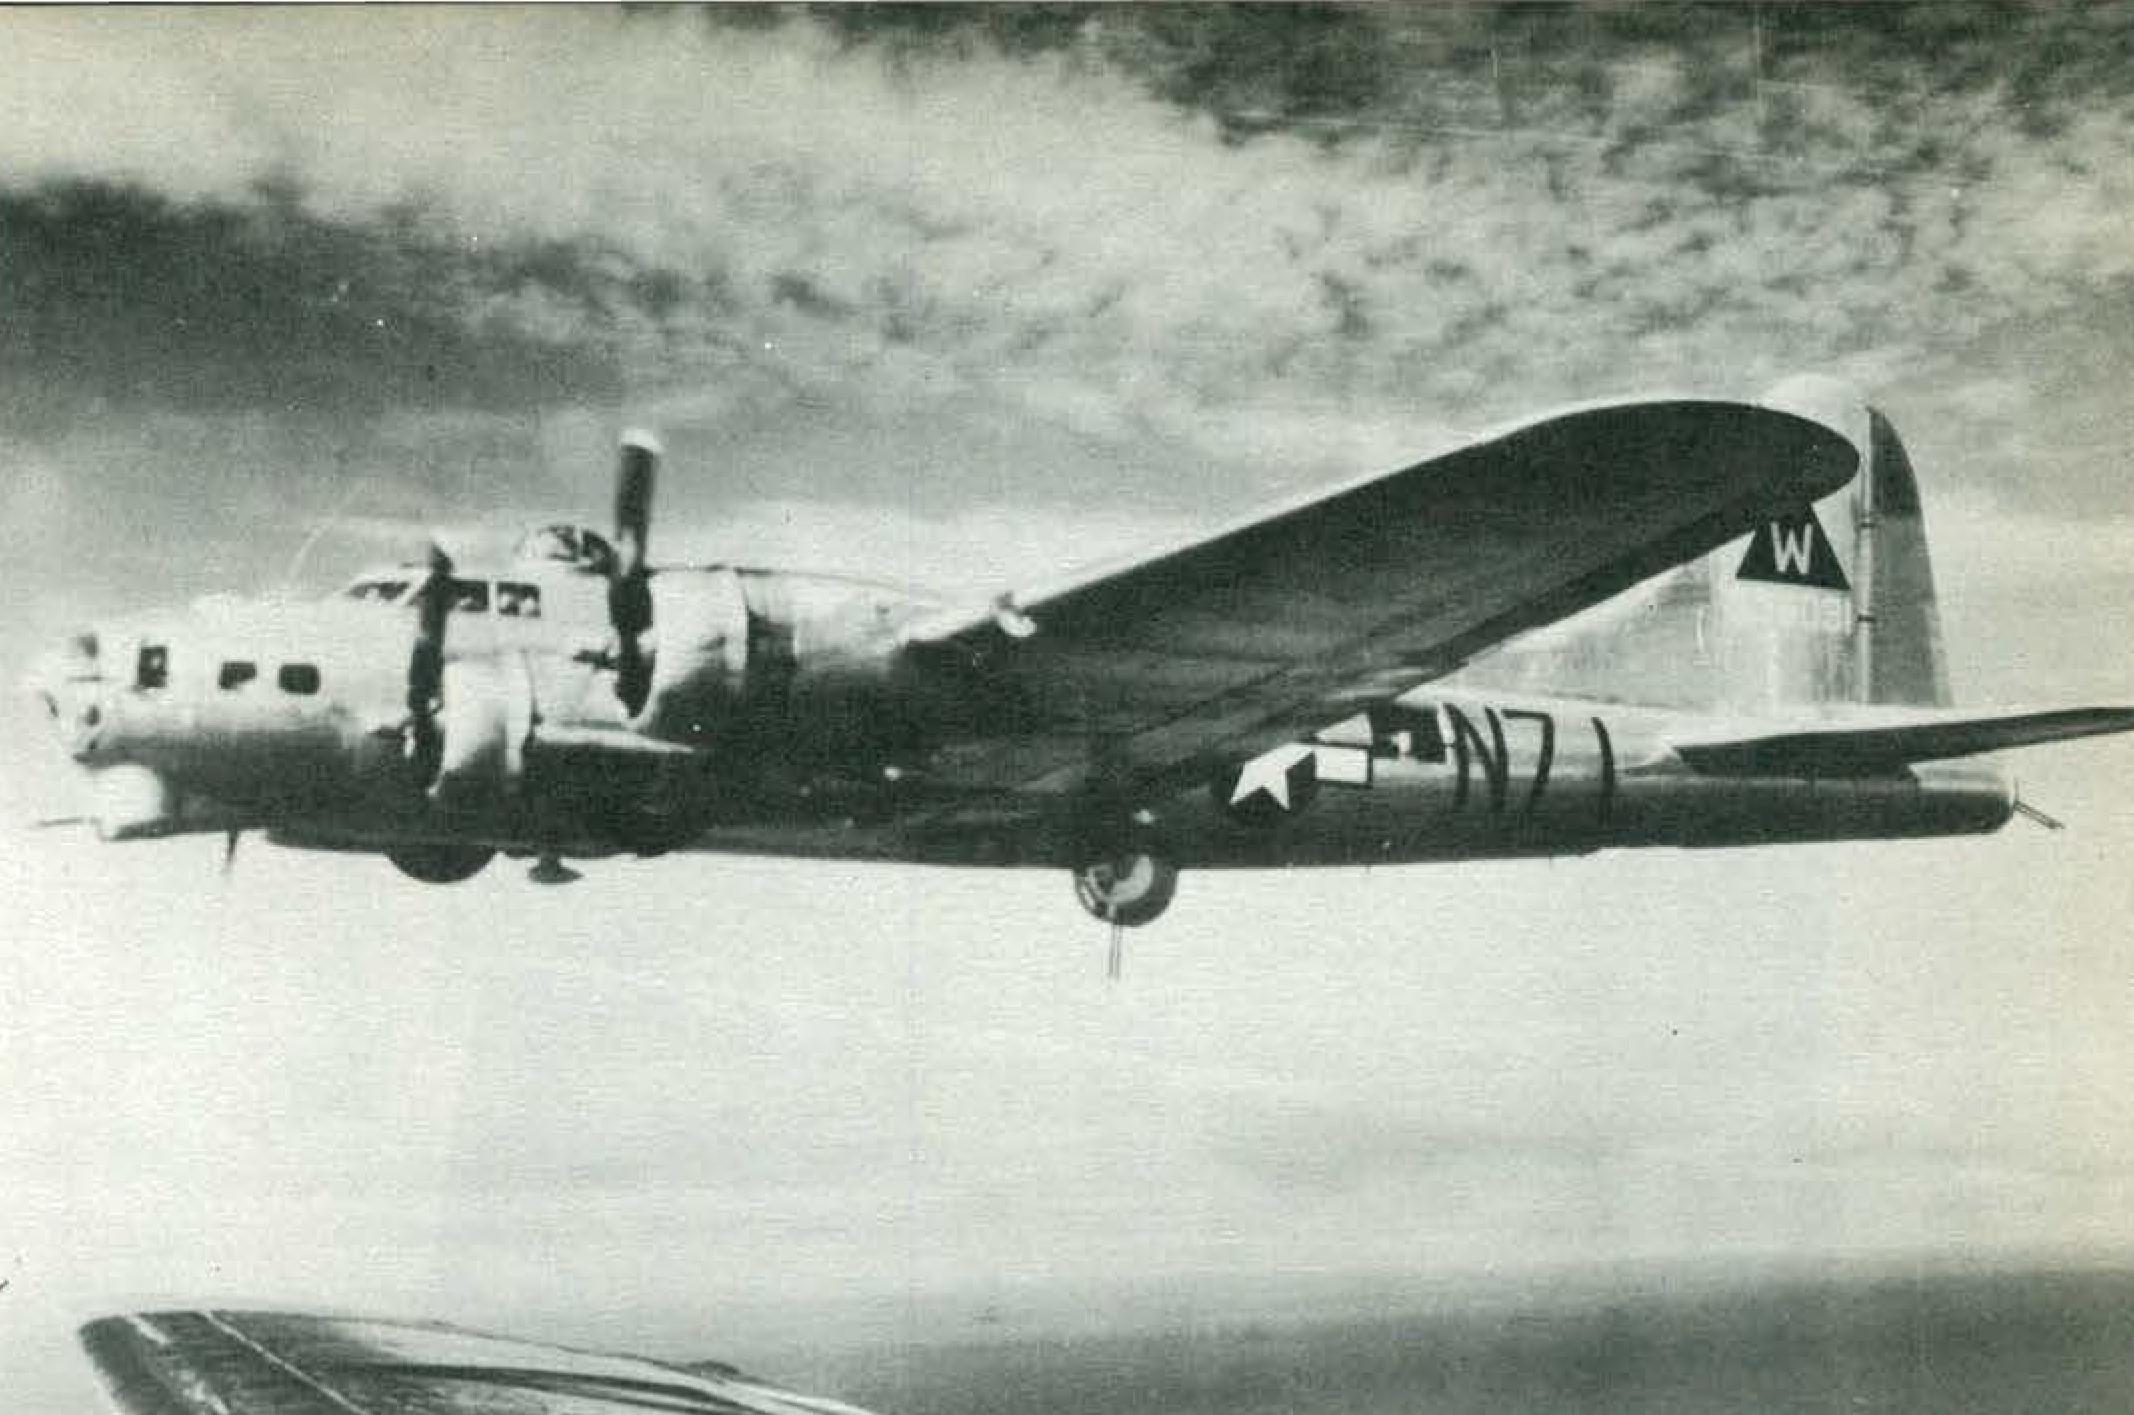 B-17 #43-38091